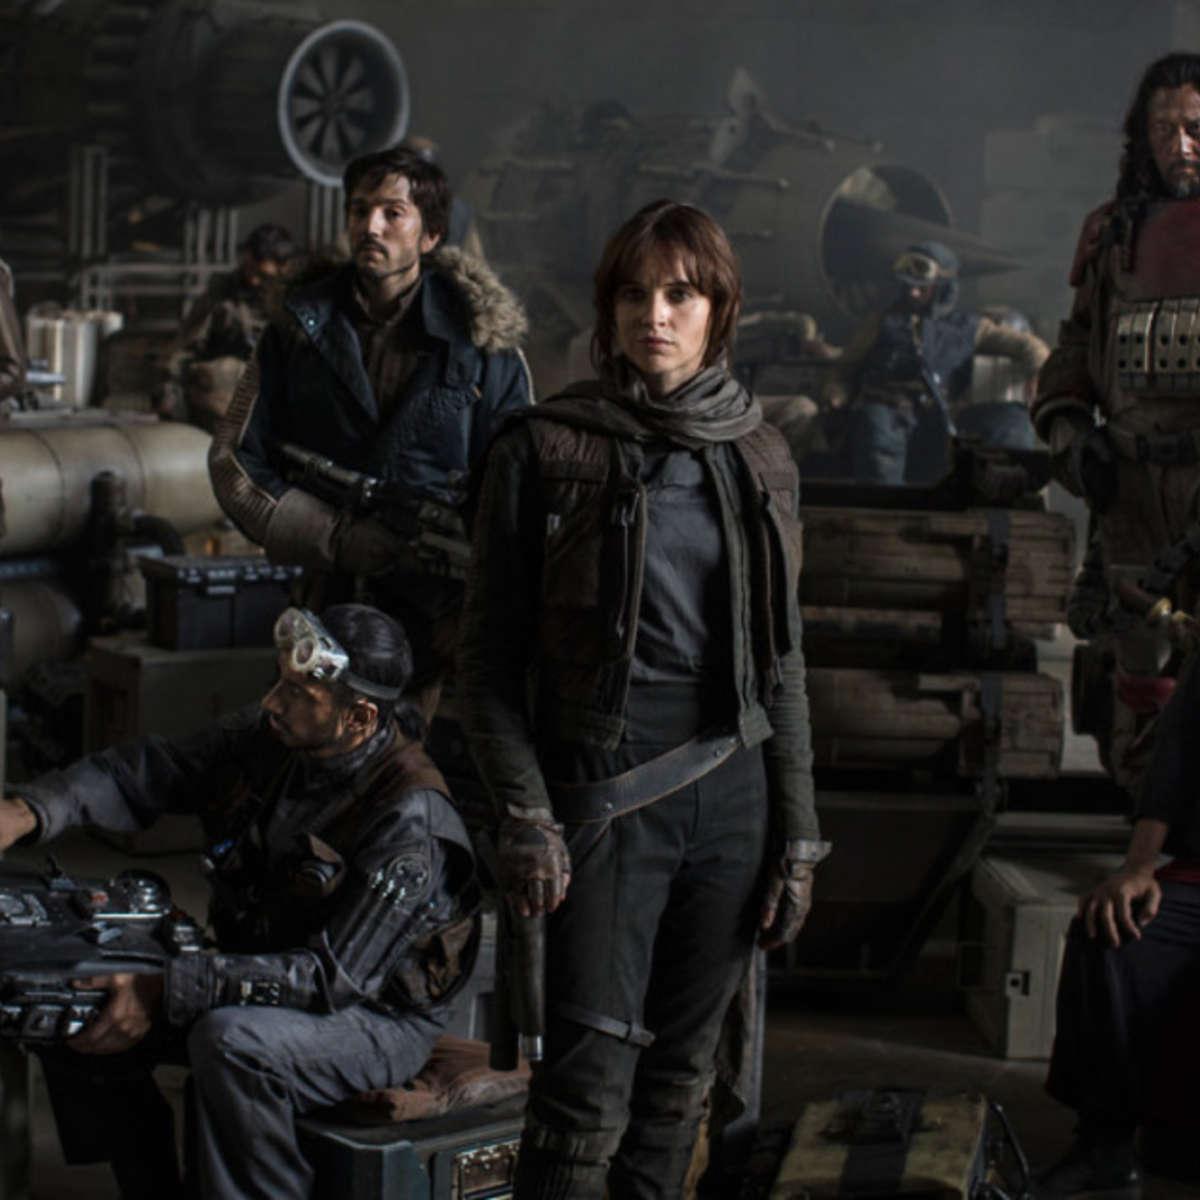 star-wars-rogue-one-cast.jpg